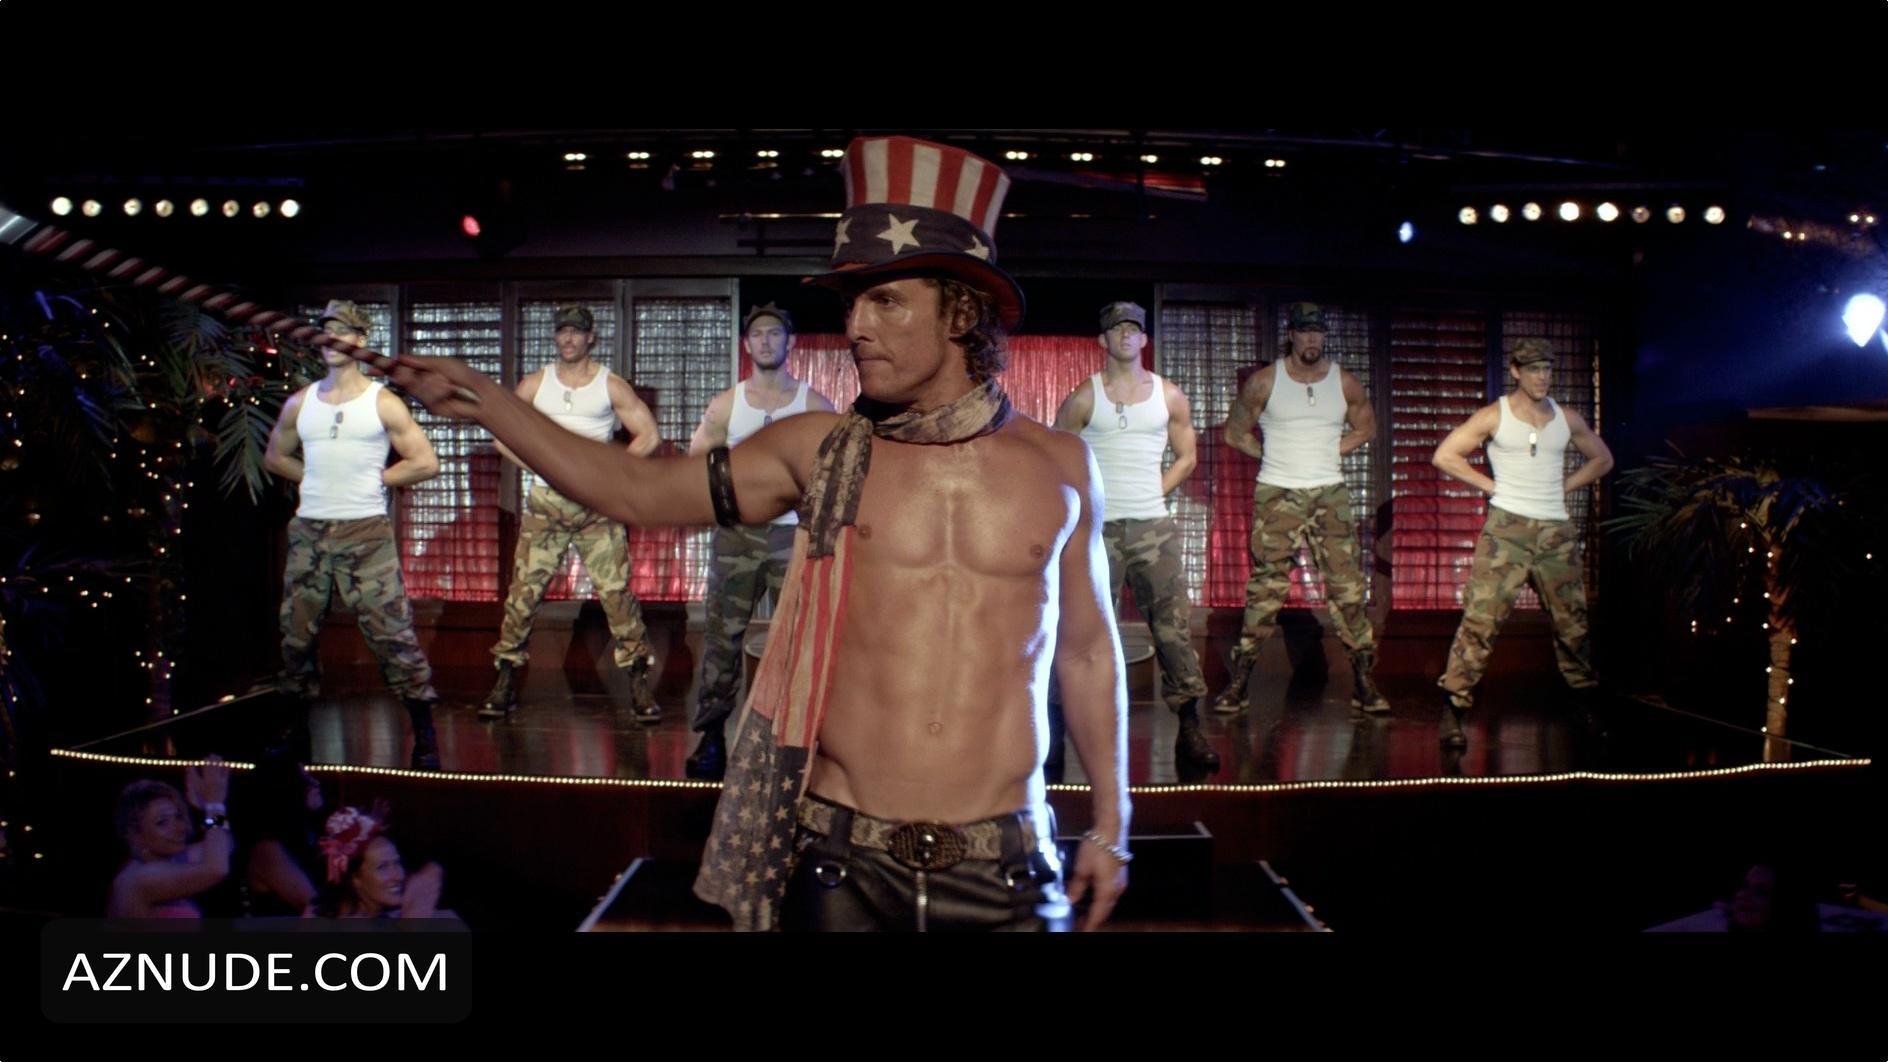 Hot Channing Tatum Nude Magic Mike Scenes